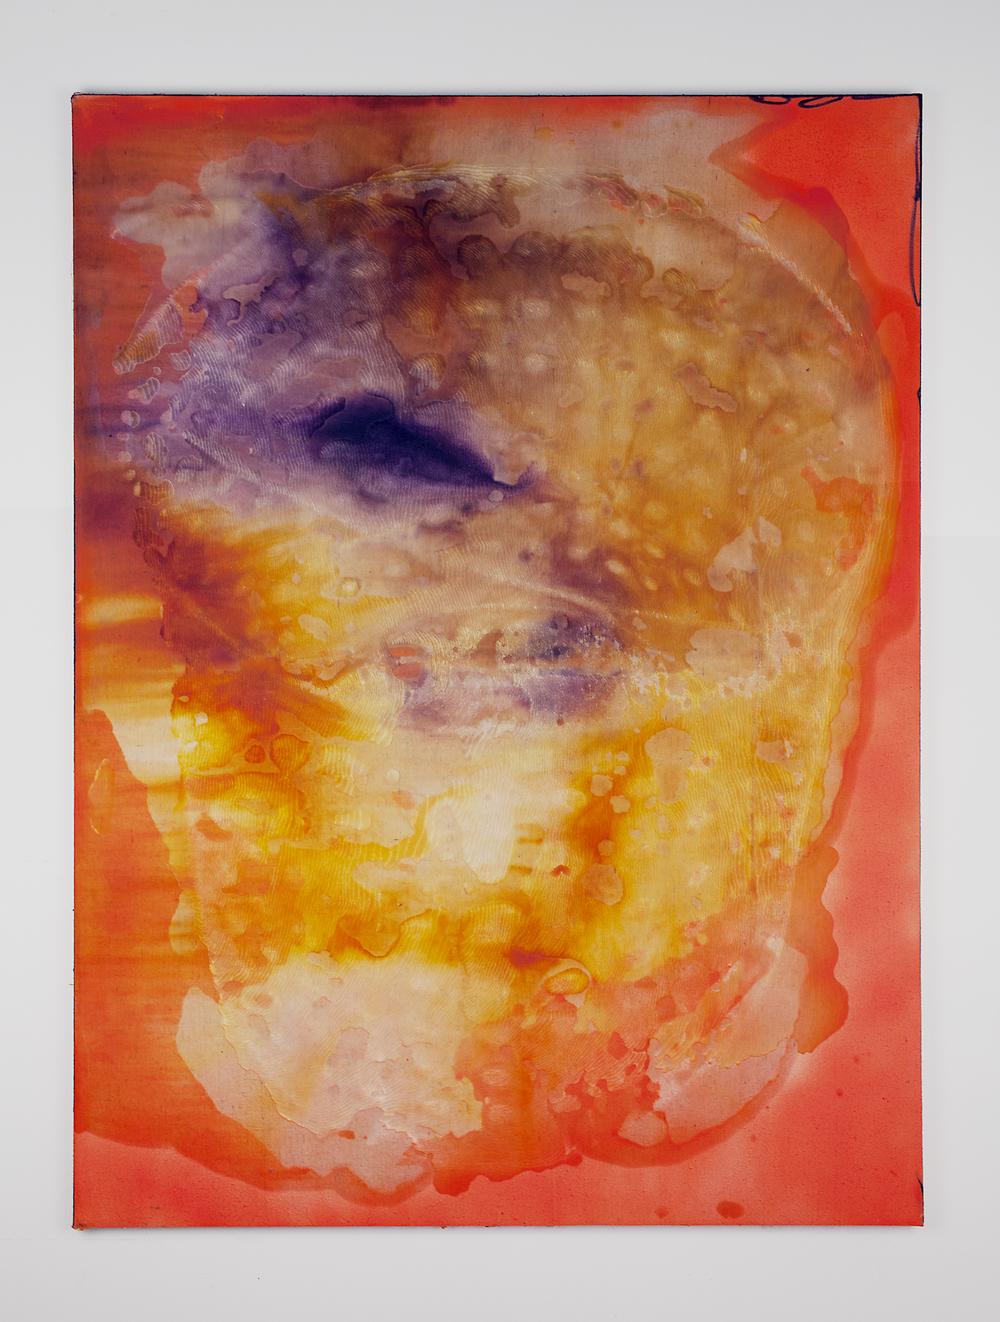 JPW3, Bucket Stamp Orange, 2015, wax, dye on canvas, 48 x 36 in.